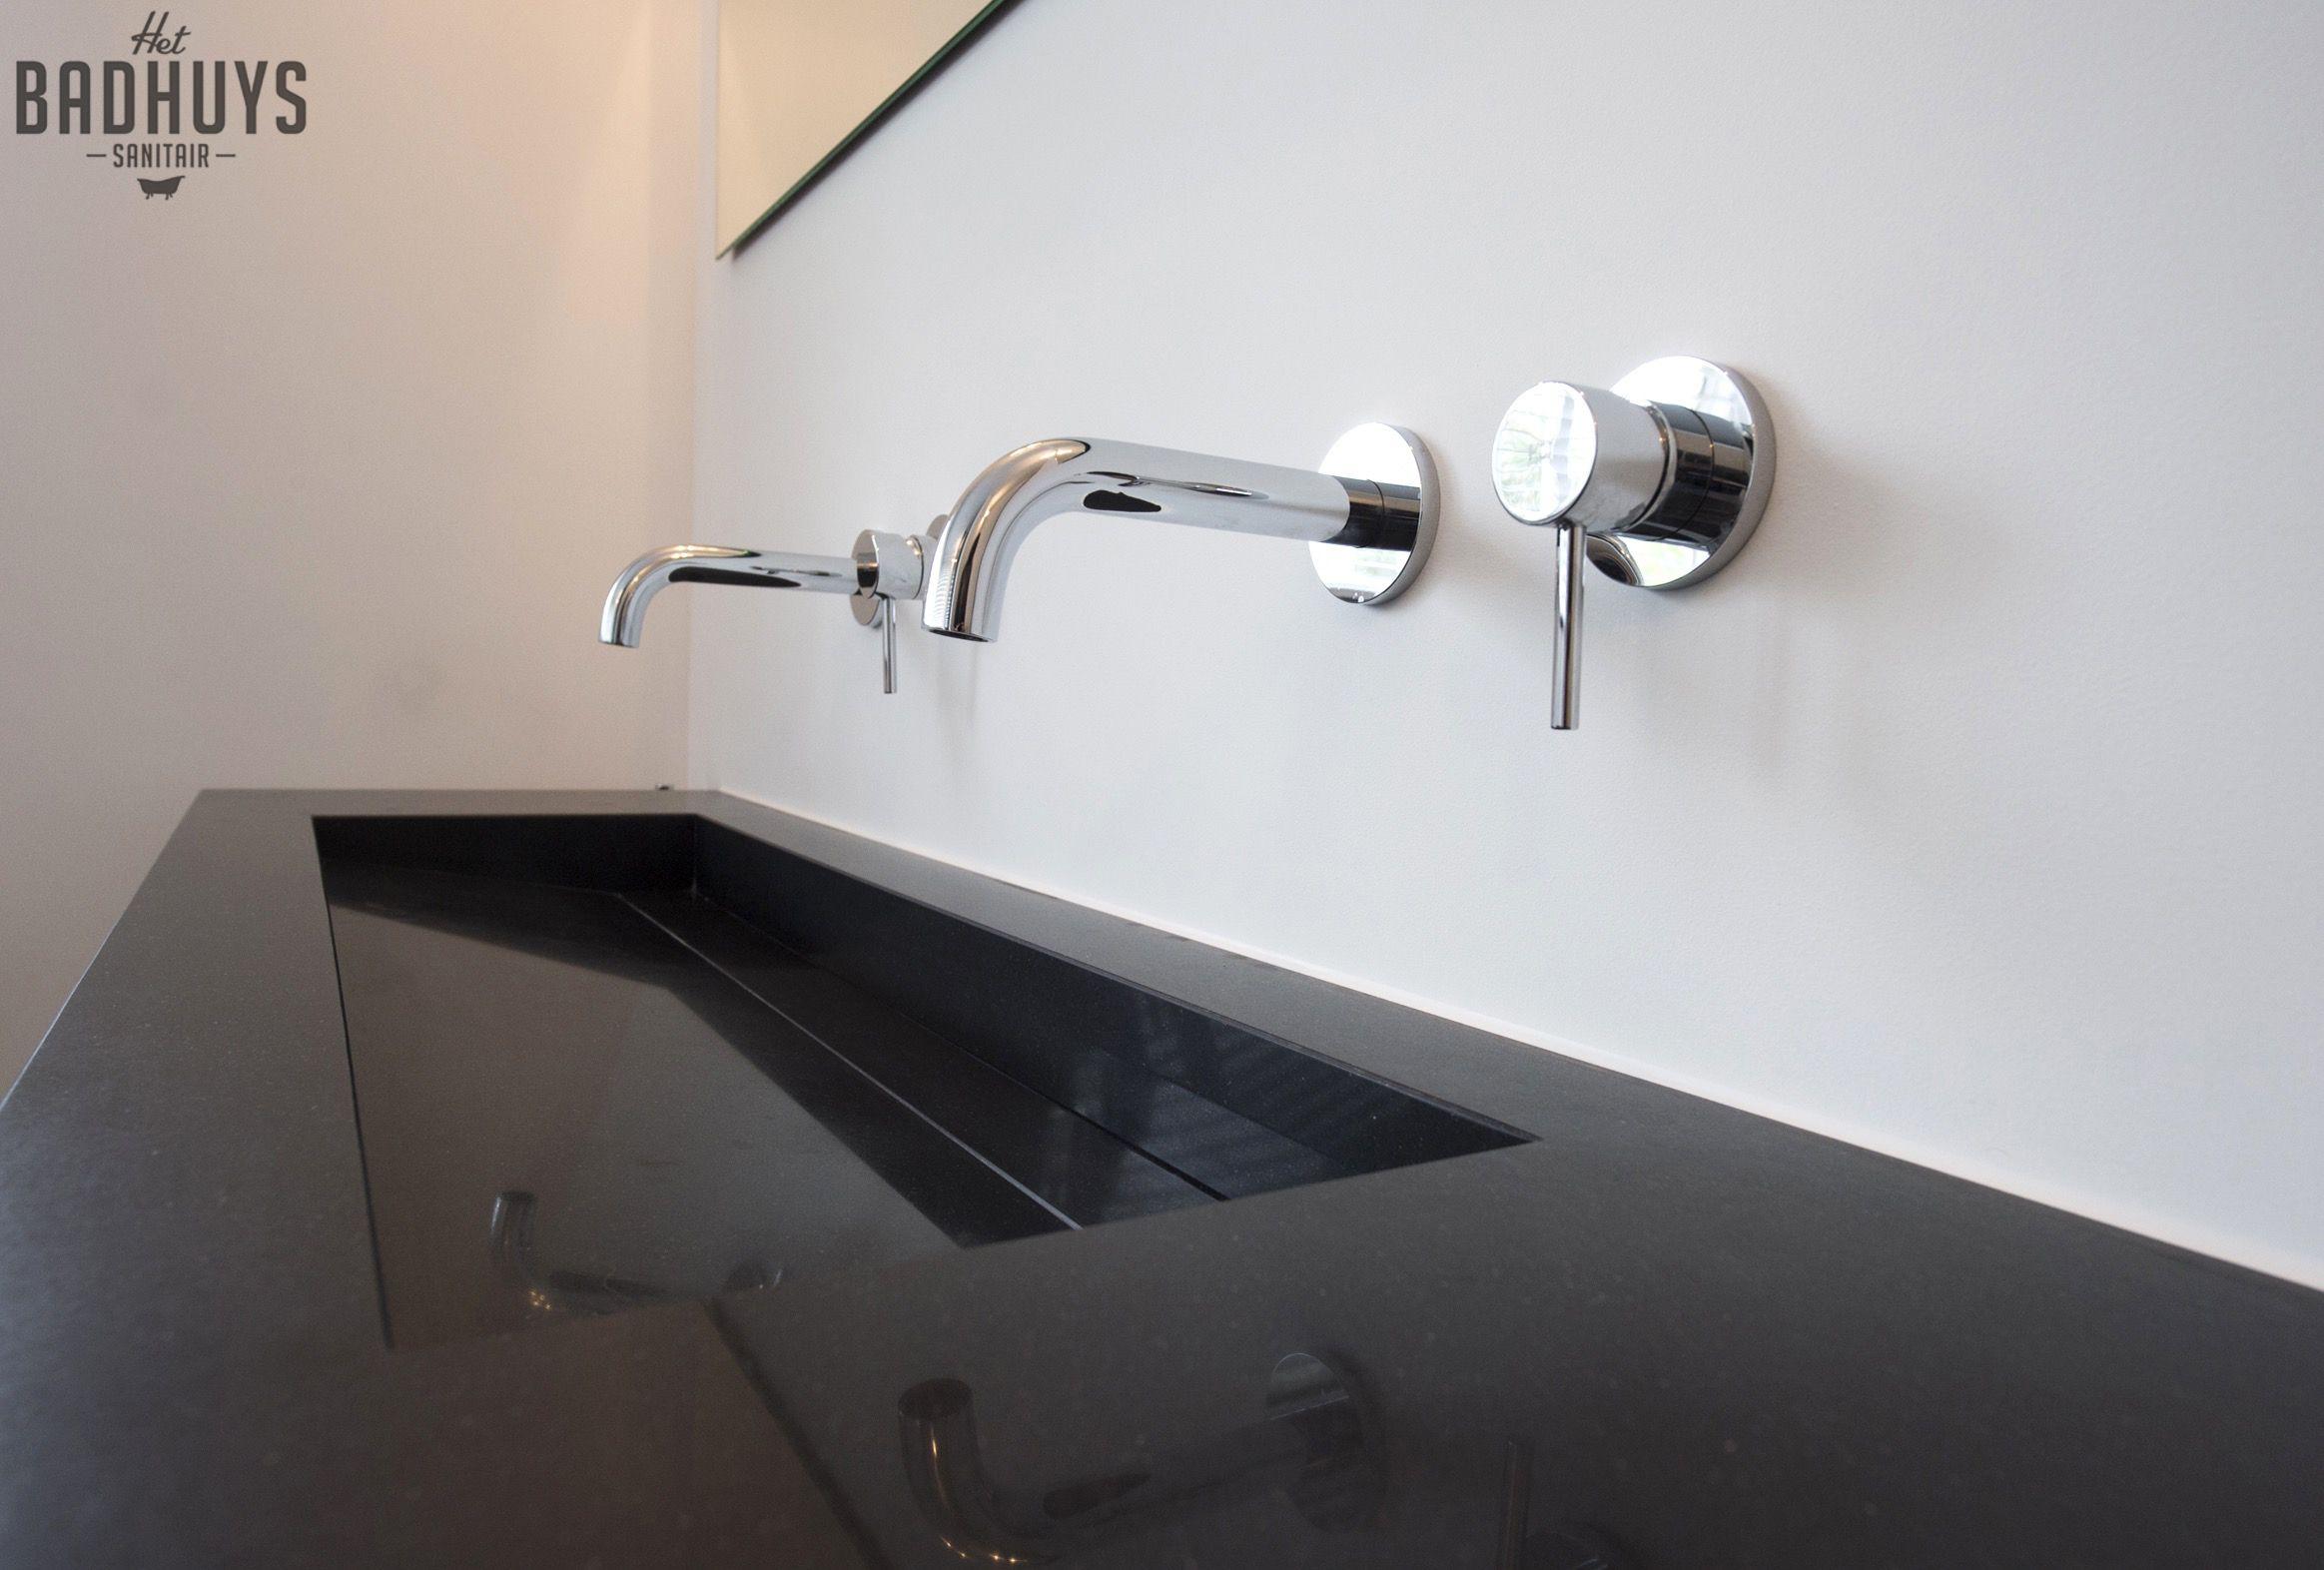 Strakke zwarte wastafel het badhuys breda badkamer pinterest